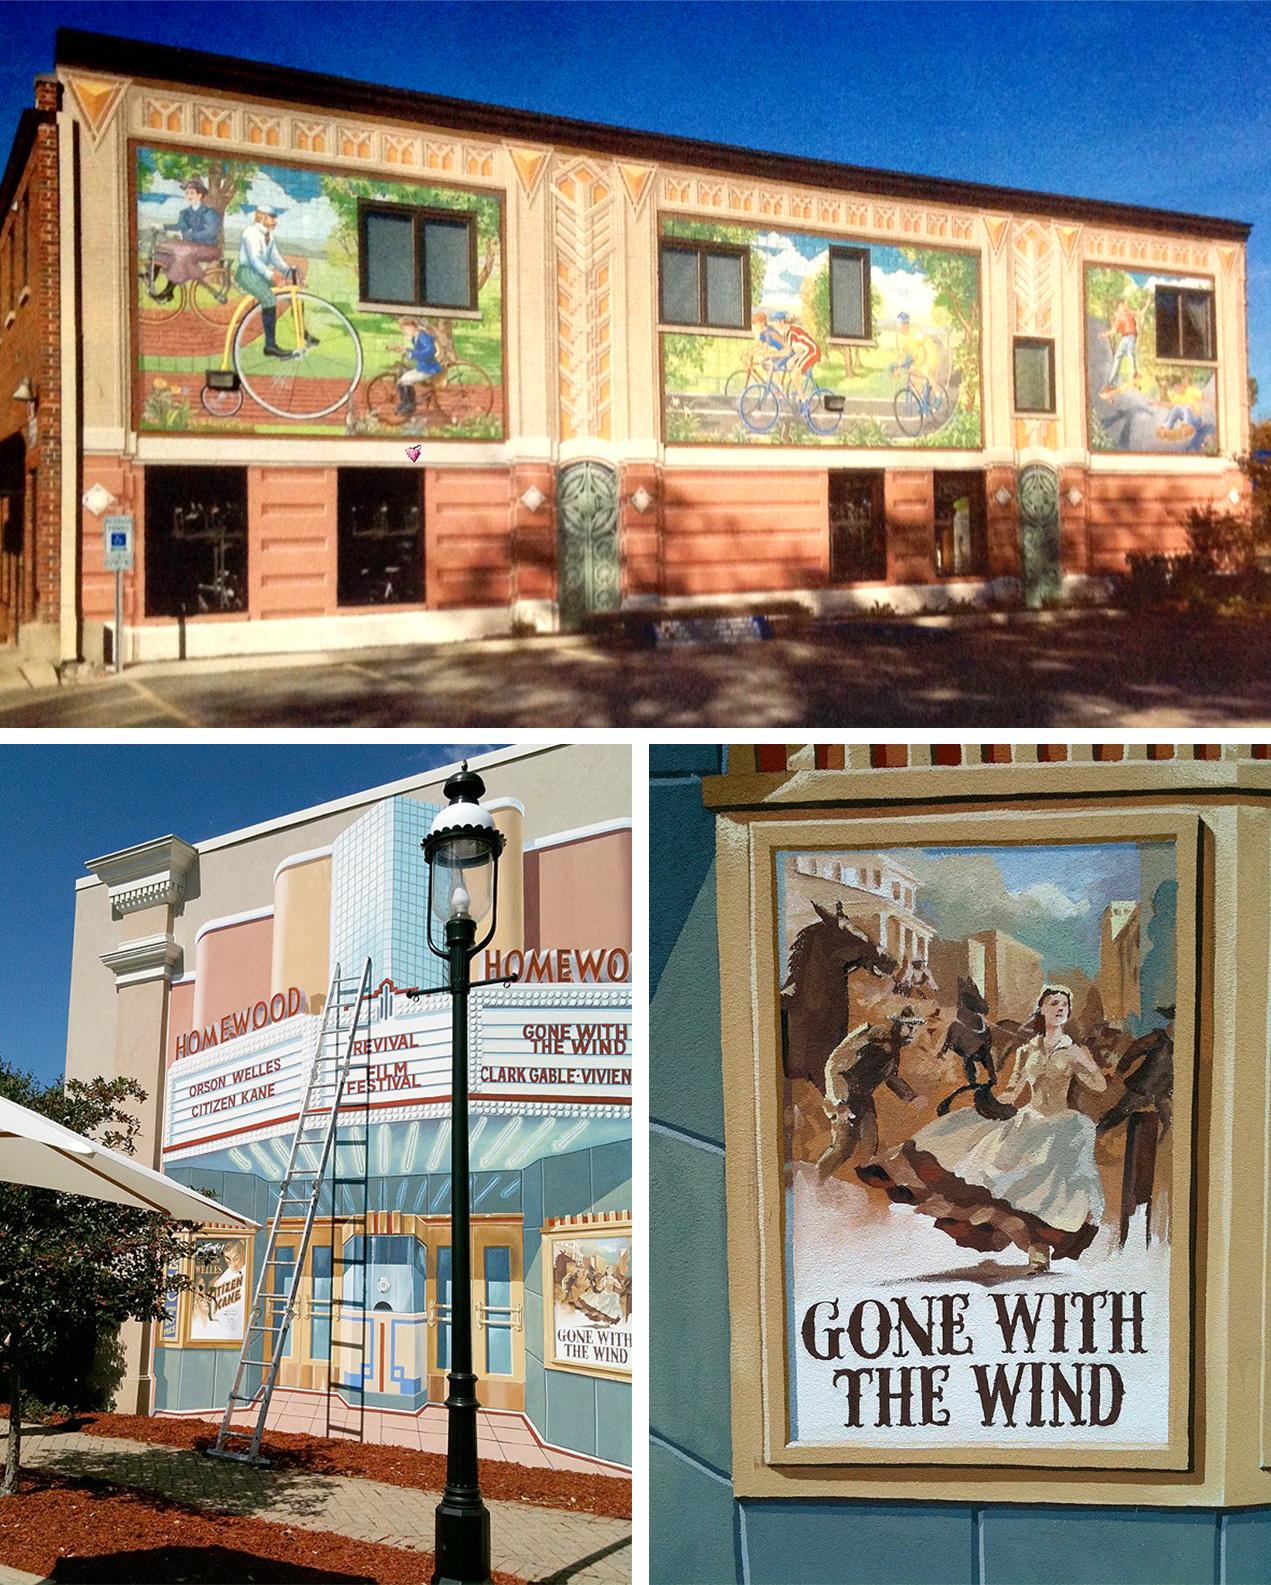 Homewood Business District Homewood, IL.  (1983-2014)